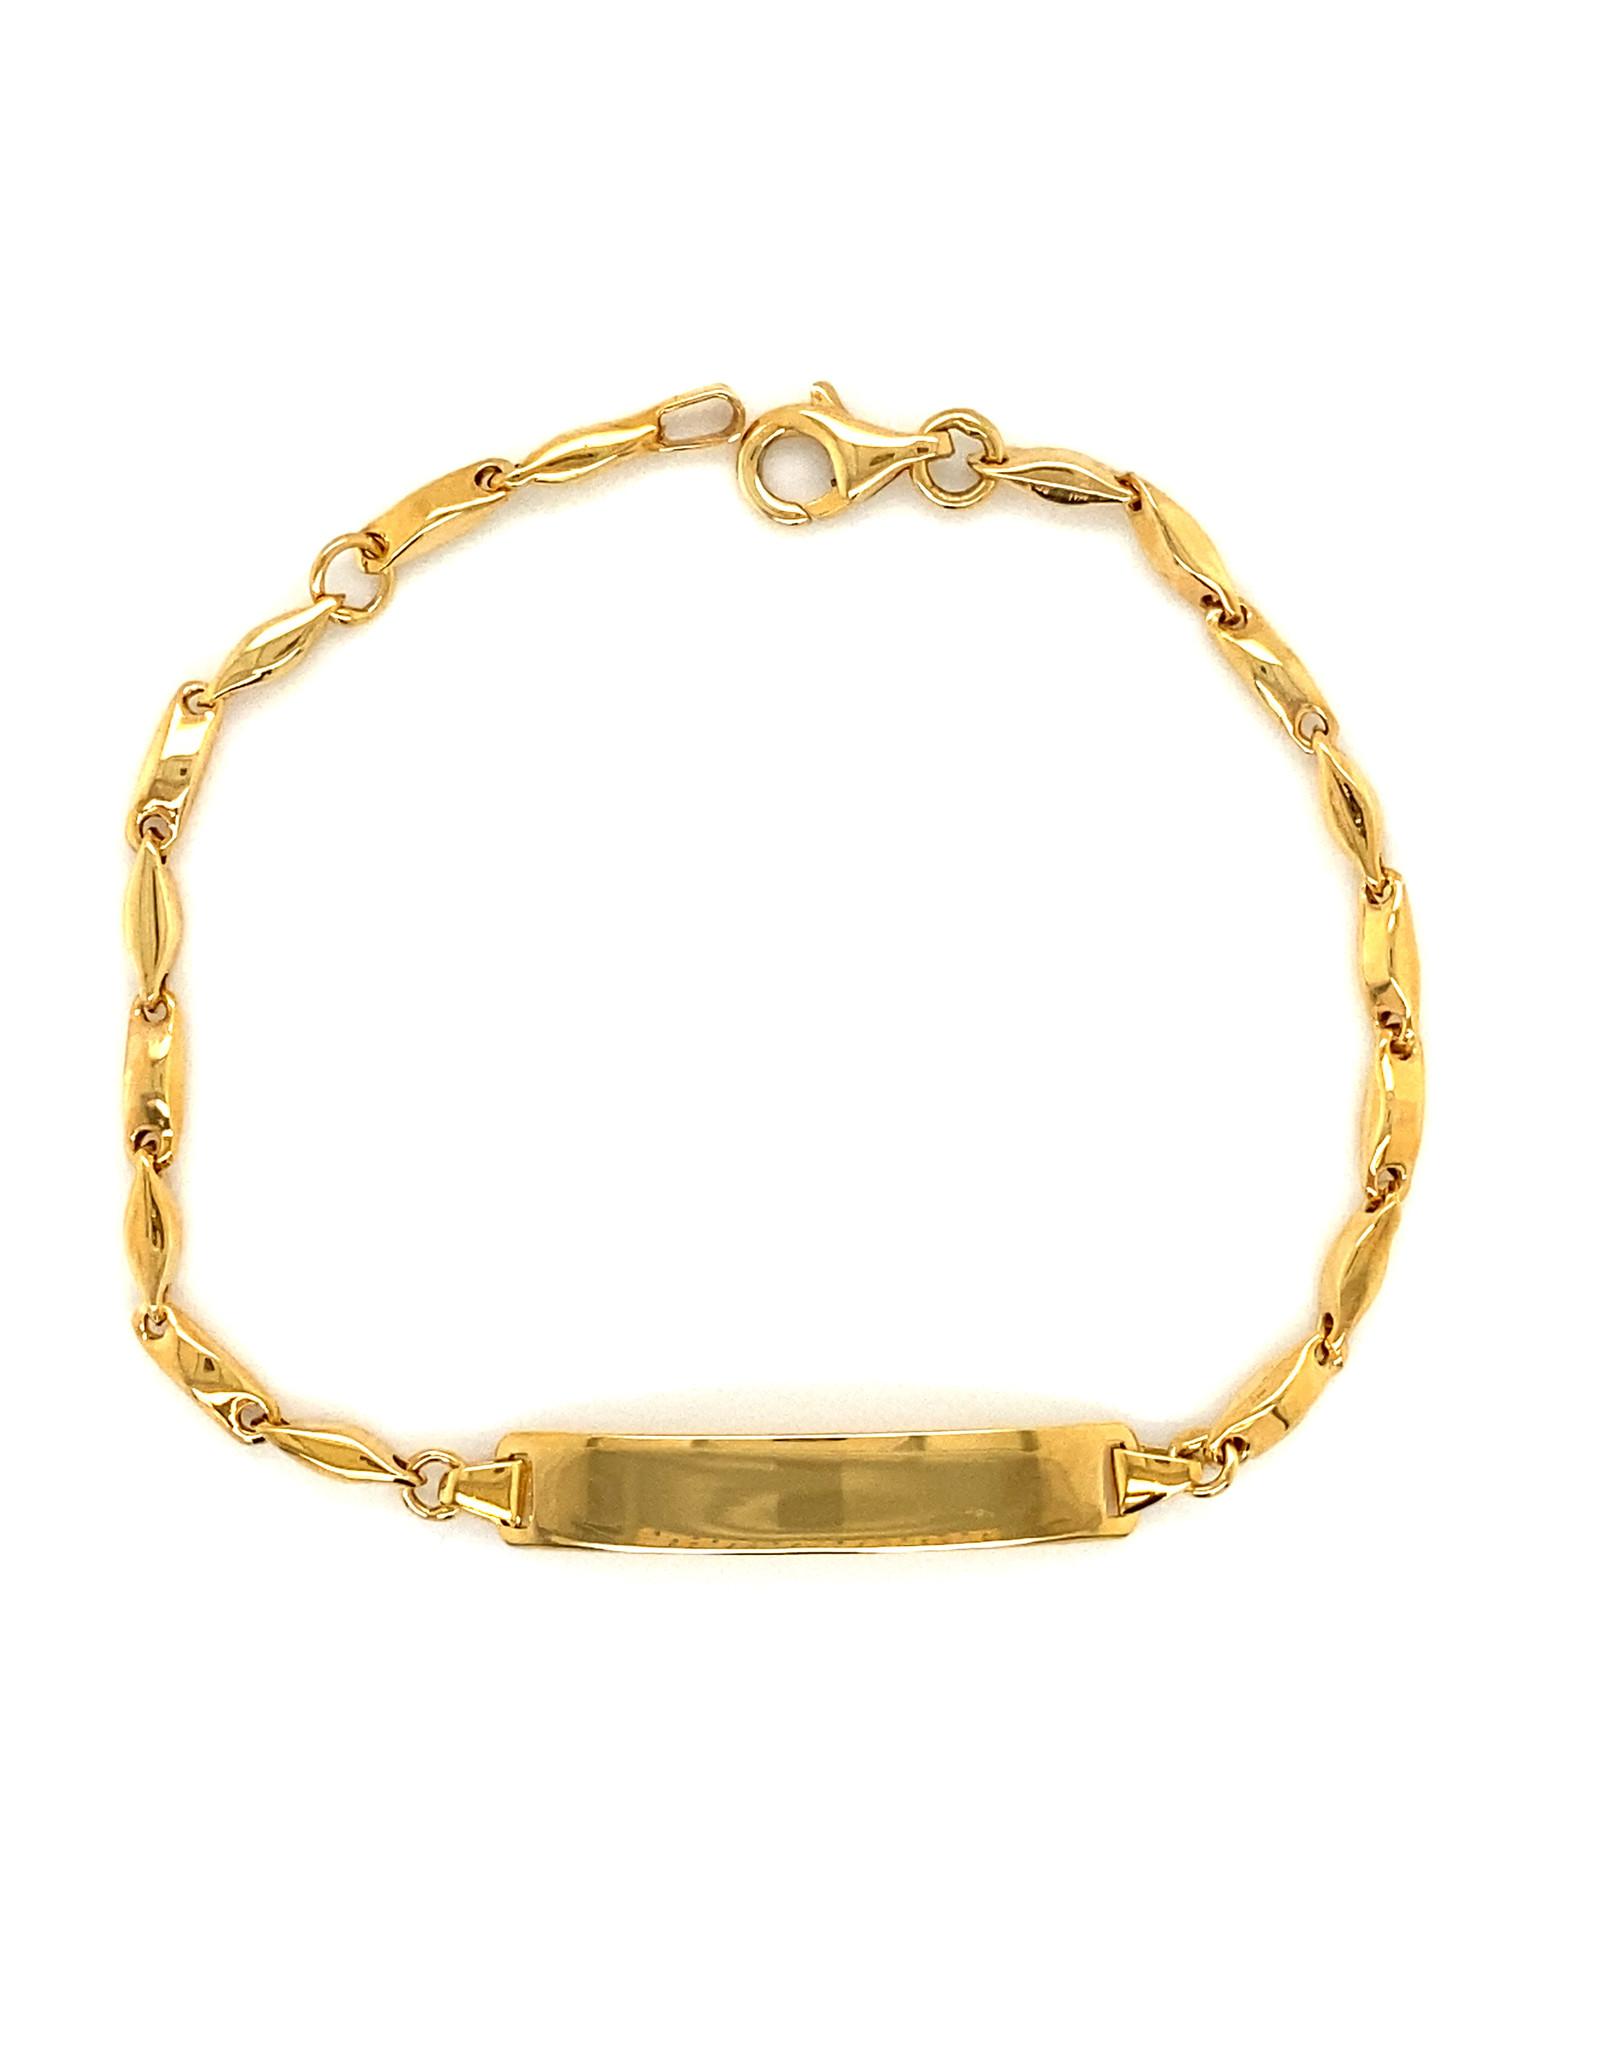 Armband geel goud 16 cm